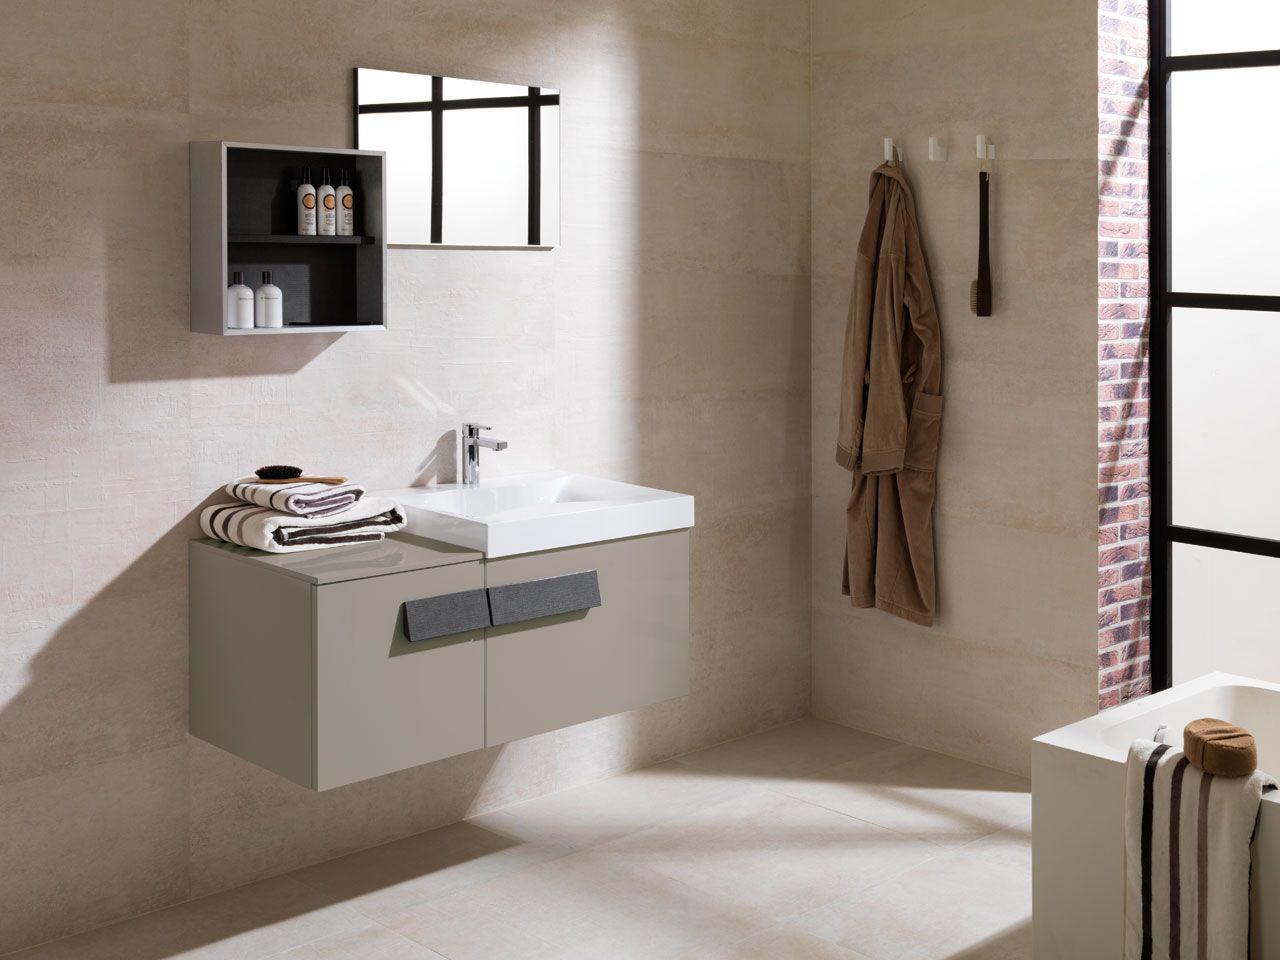 Bathroom furniture PORCELANOSA Grupo showcases a wide